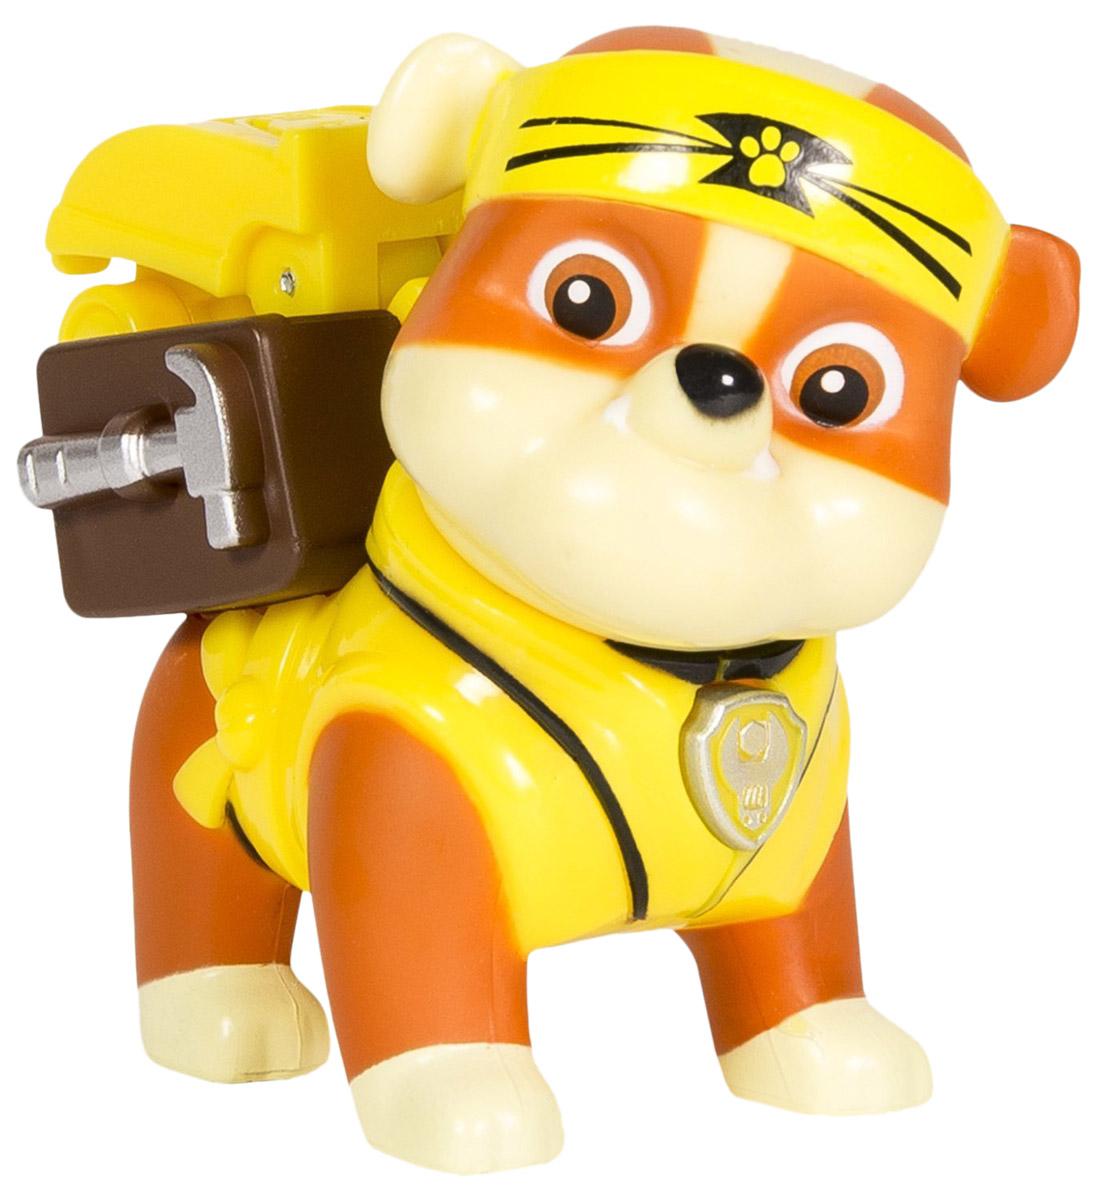 цены на Paw Patrol Фигурка Rubble с рюкзаком-трансформером  в интернет-магазинах